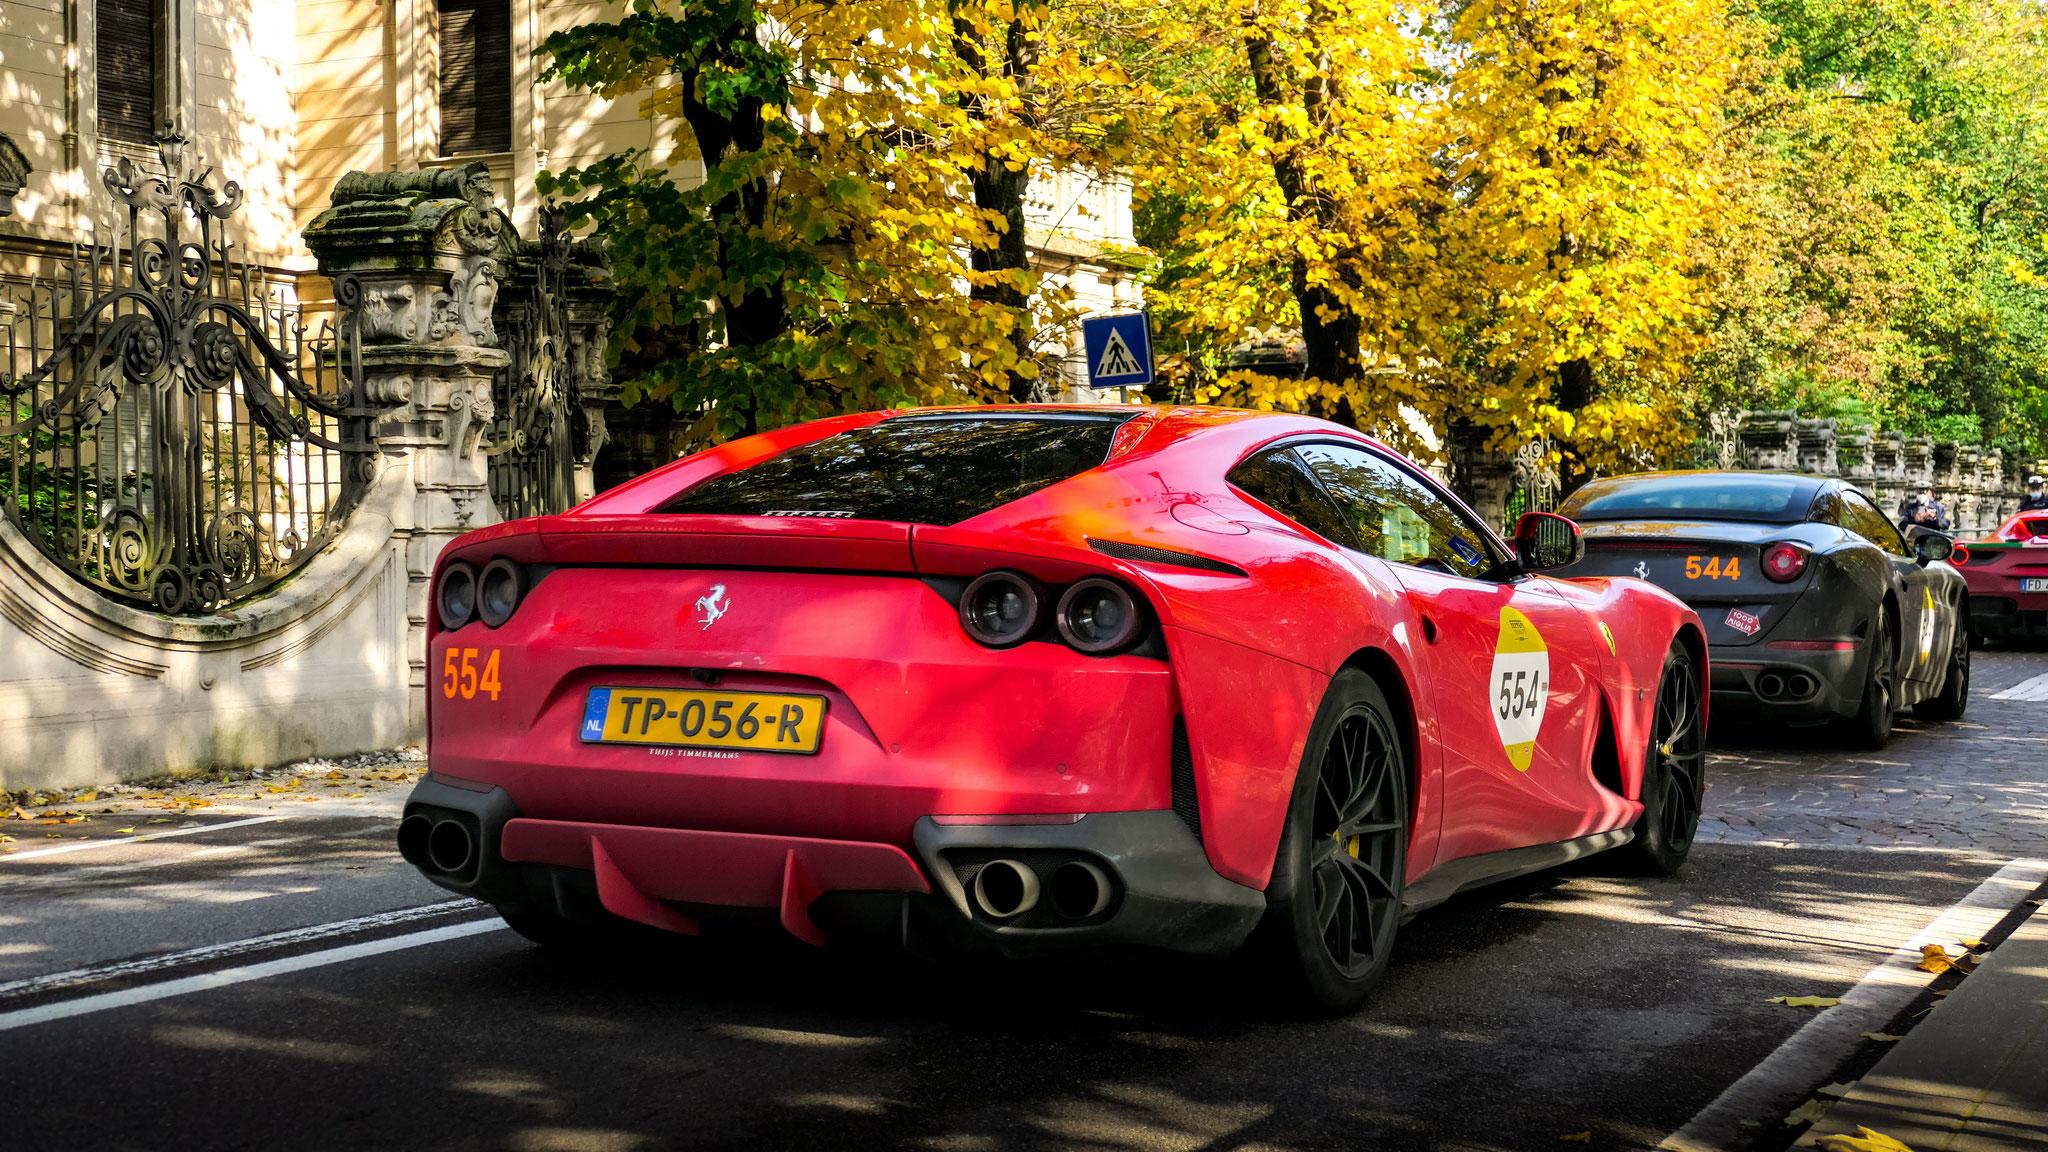 Ferrari 812 Superfast - TP-056-R (NL)